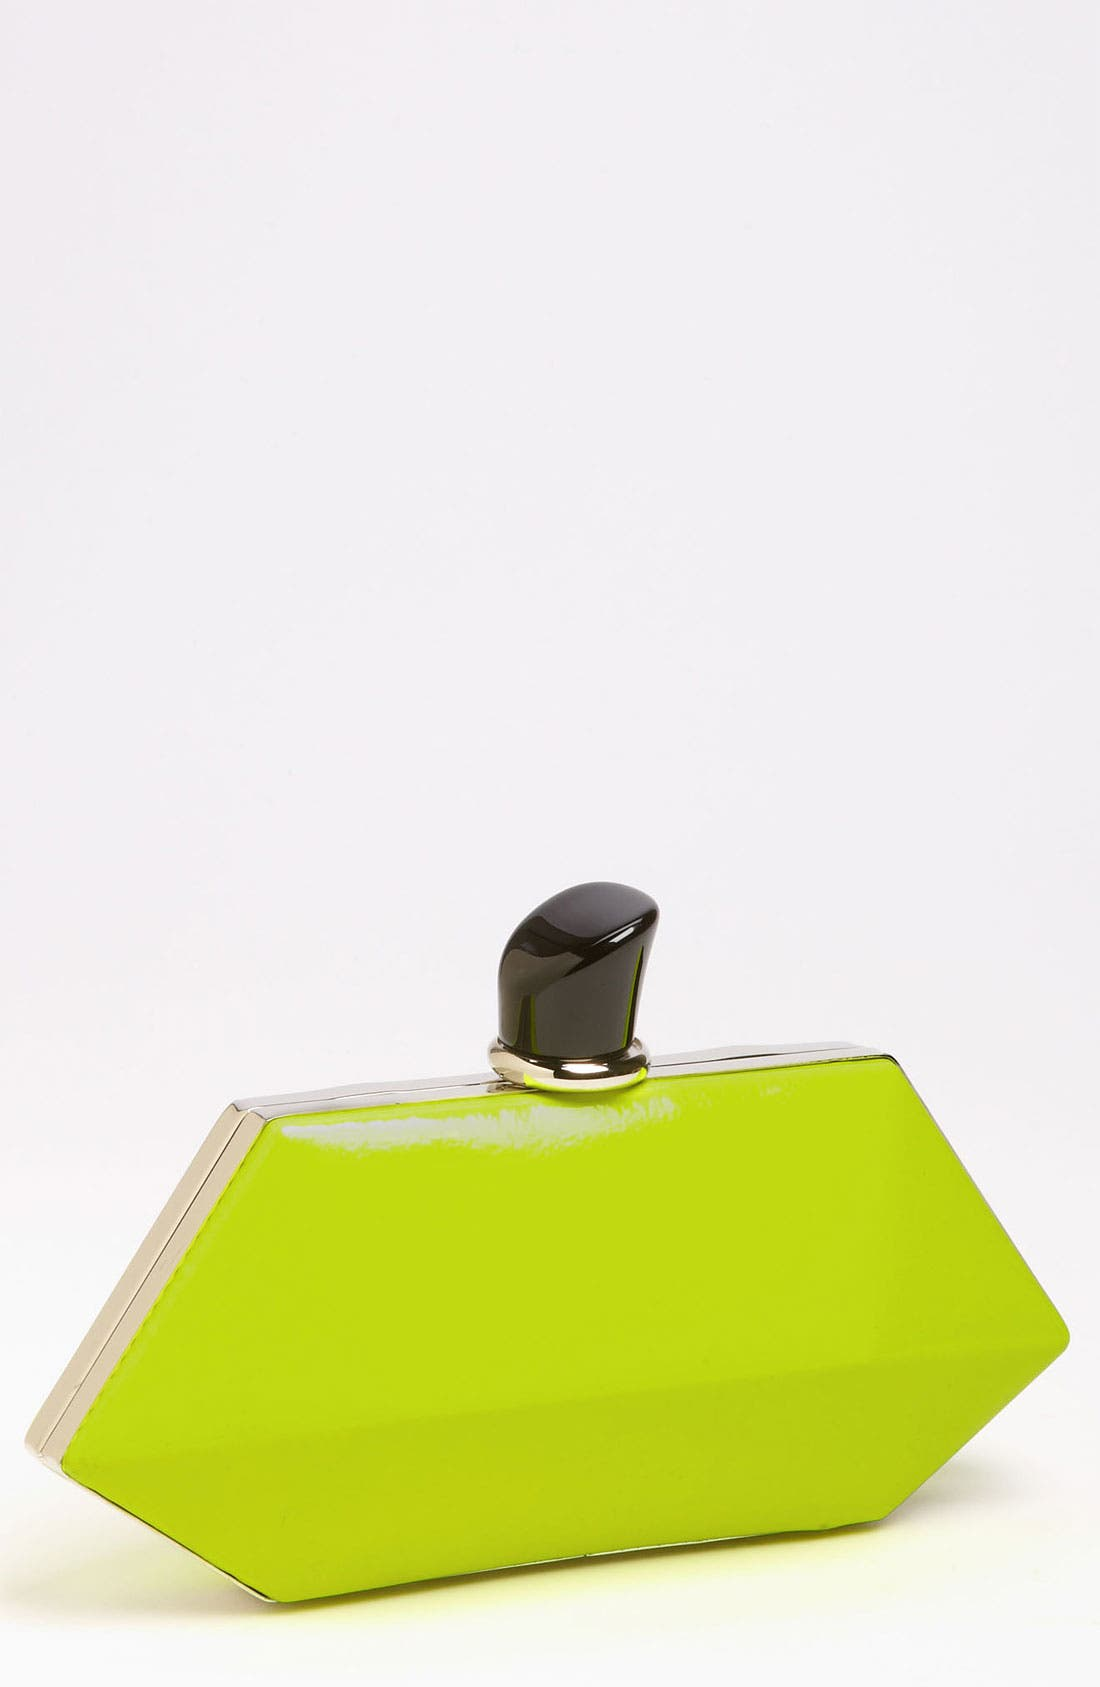 Main Image - High Fashion Handbags Clutch